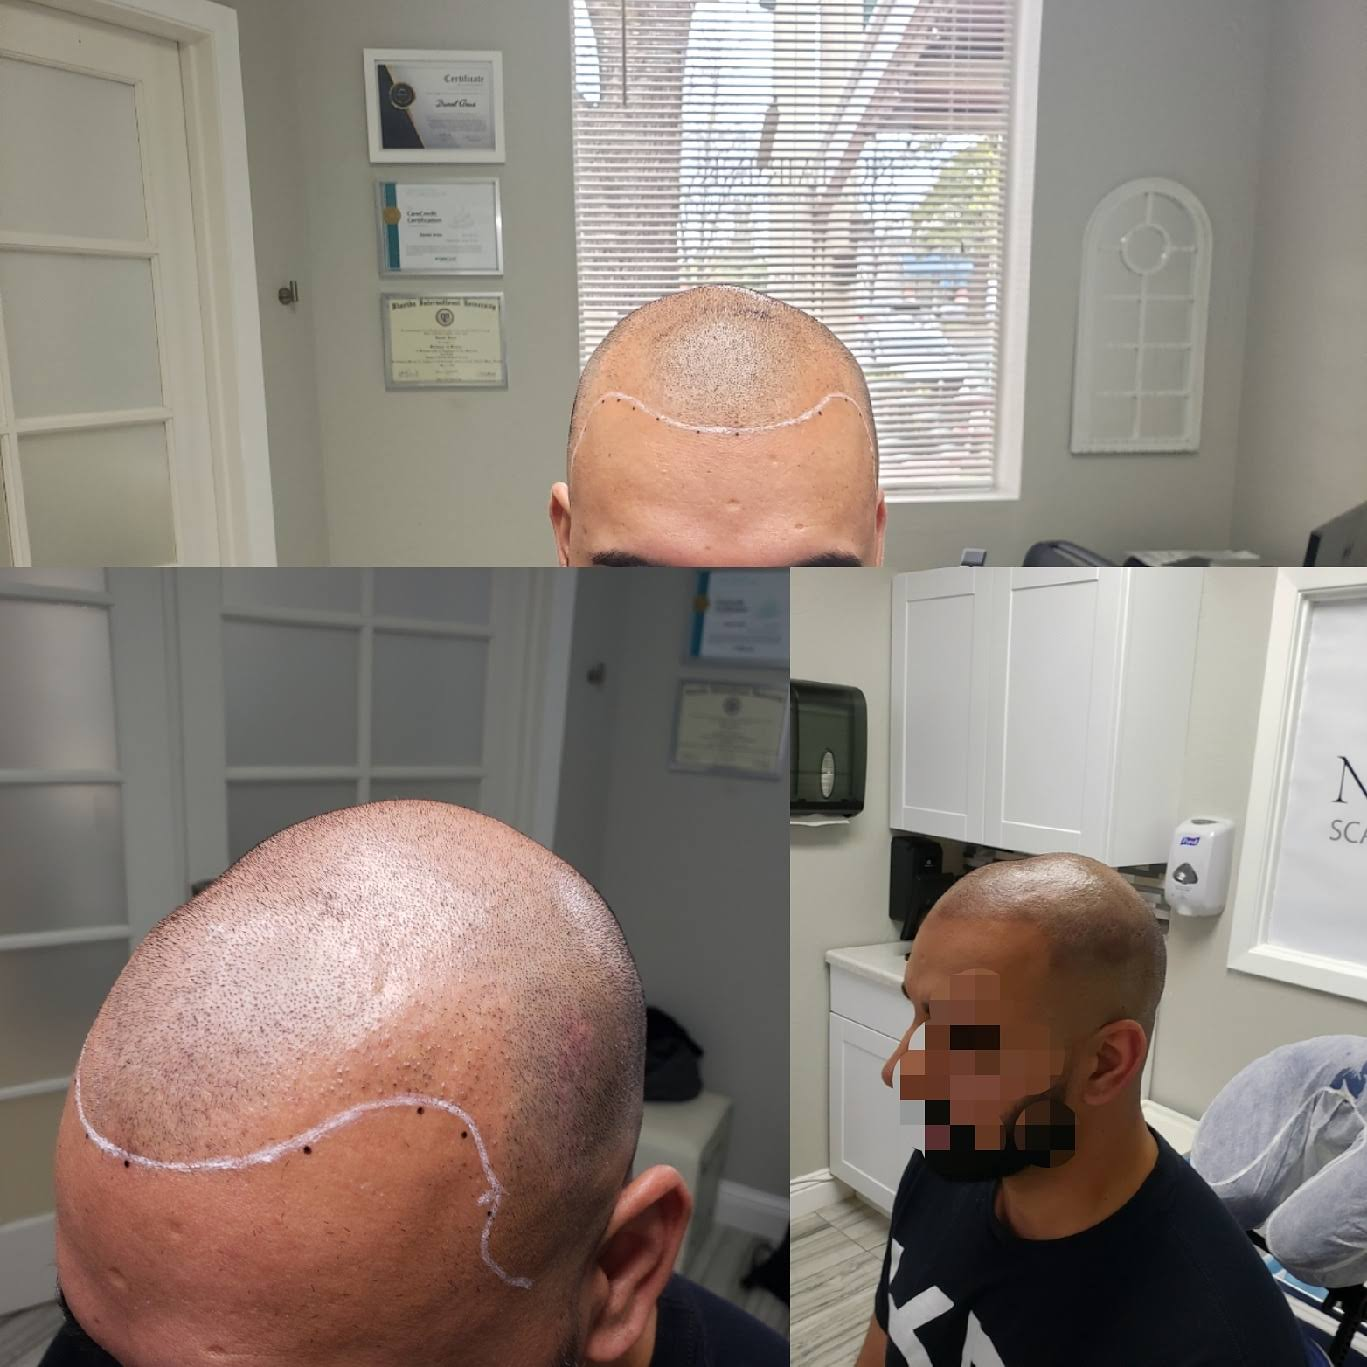 NuHair Ink Scalp MicroPigmentation & Aesthetic Clinic of Sacramento | 901 Sunrise Ave A19, Roseville, CA, 95661 | +1 (916) 800-8305